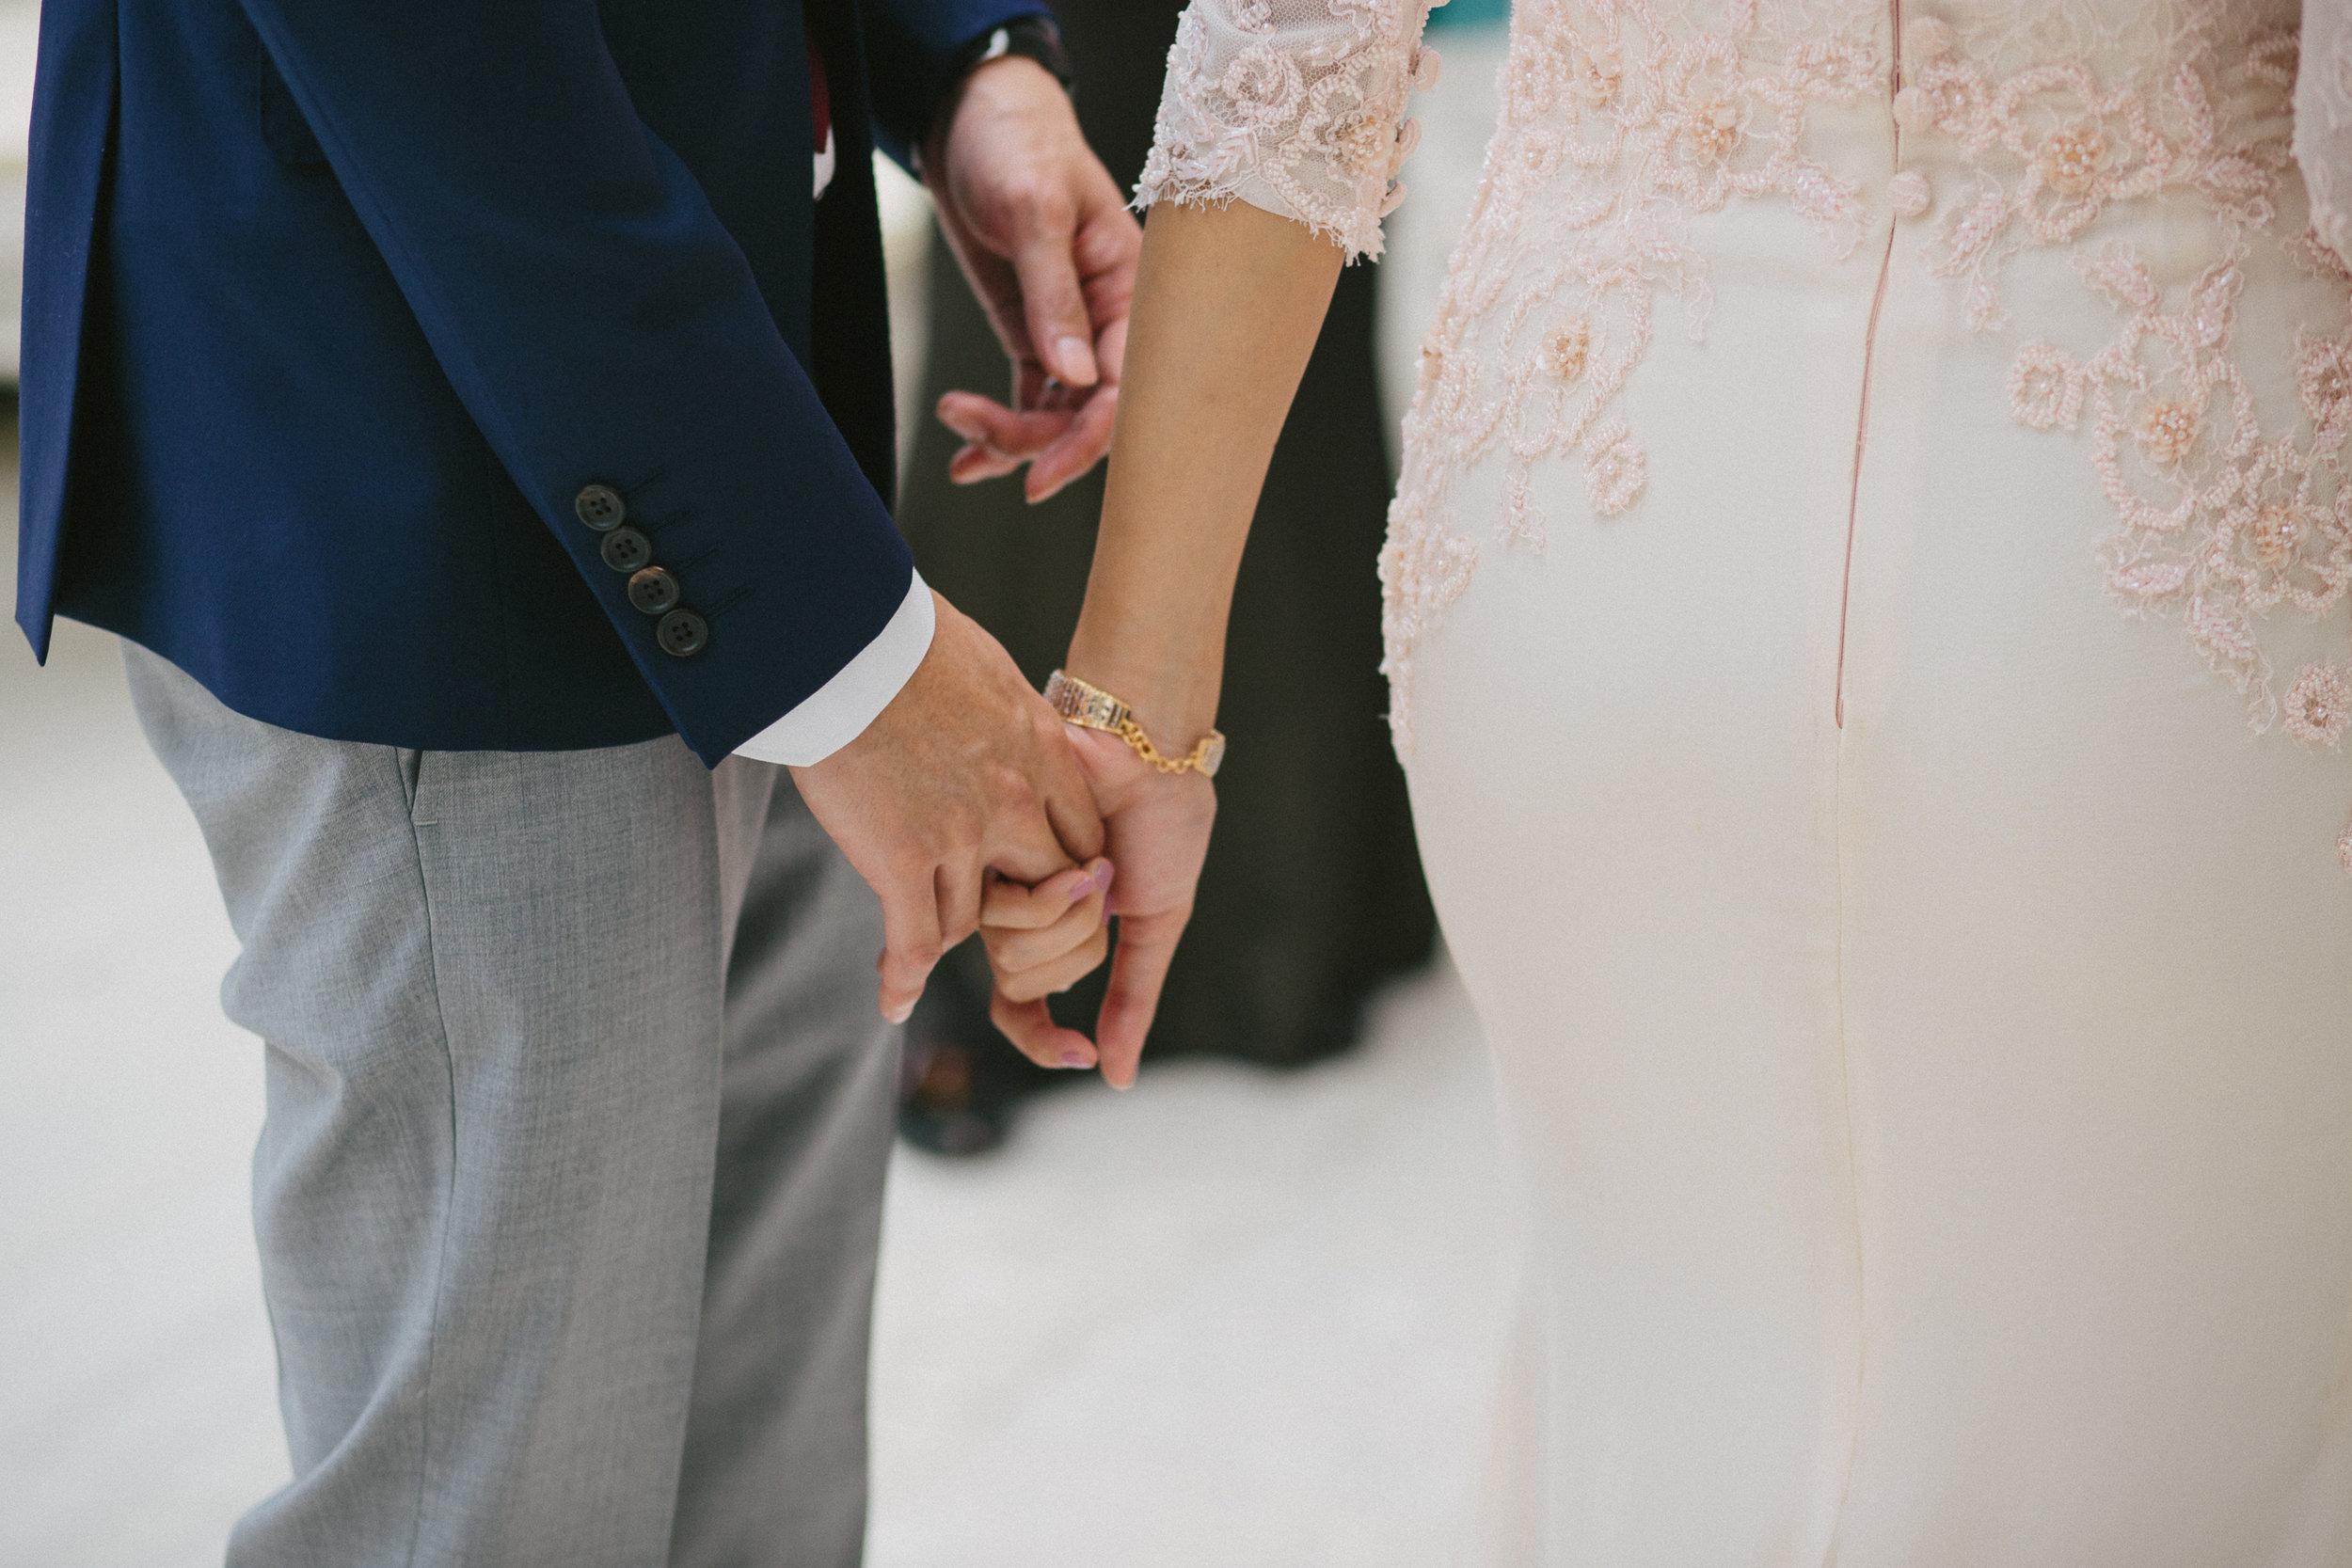 singapore-wedding-photographer-fadilah-kwan-072.jpg